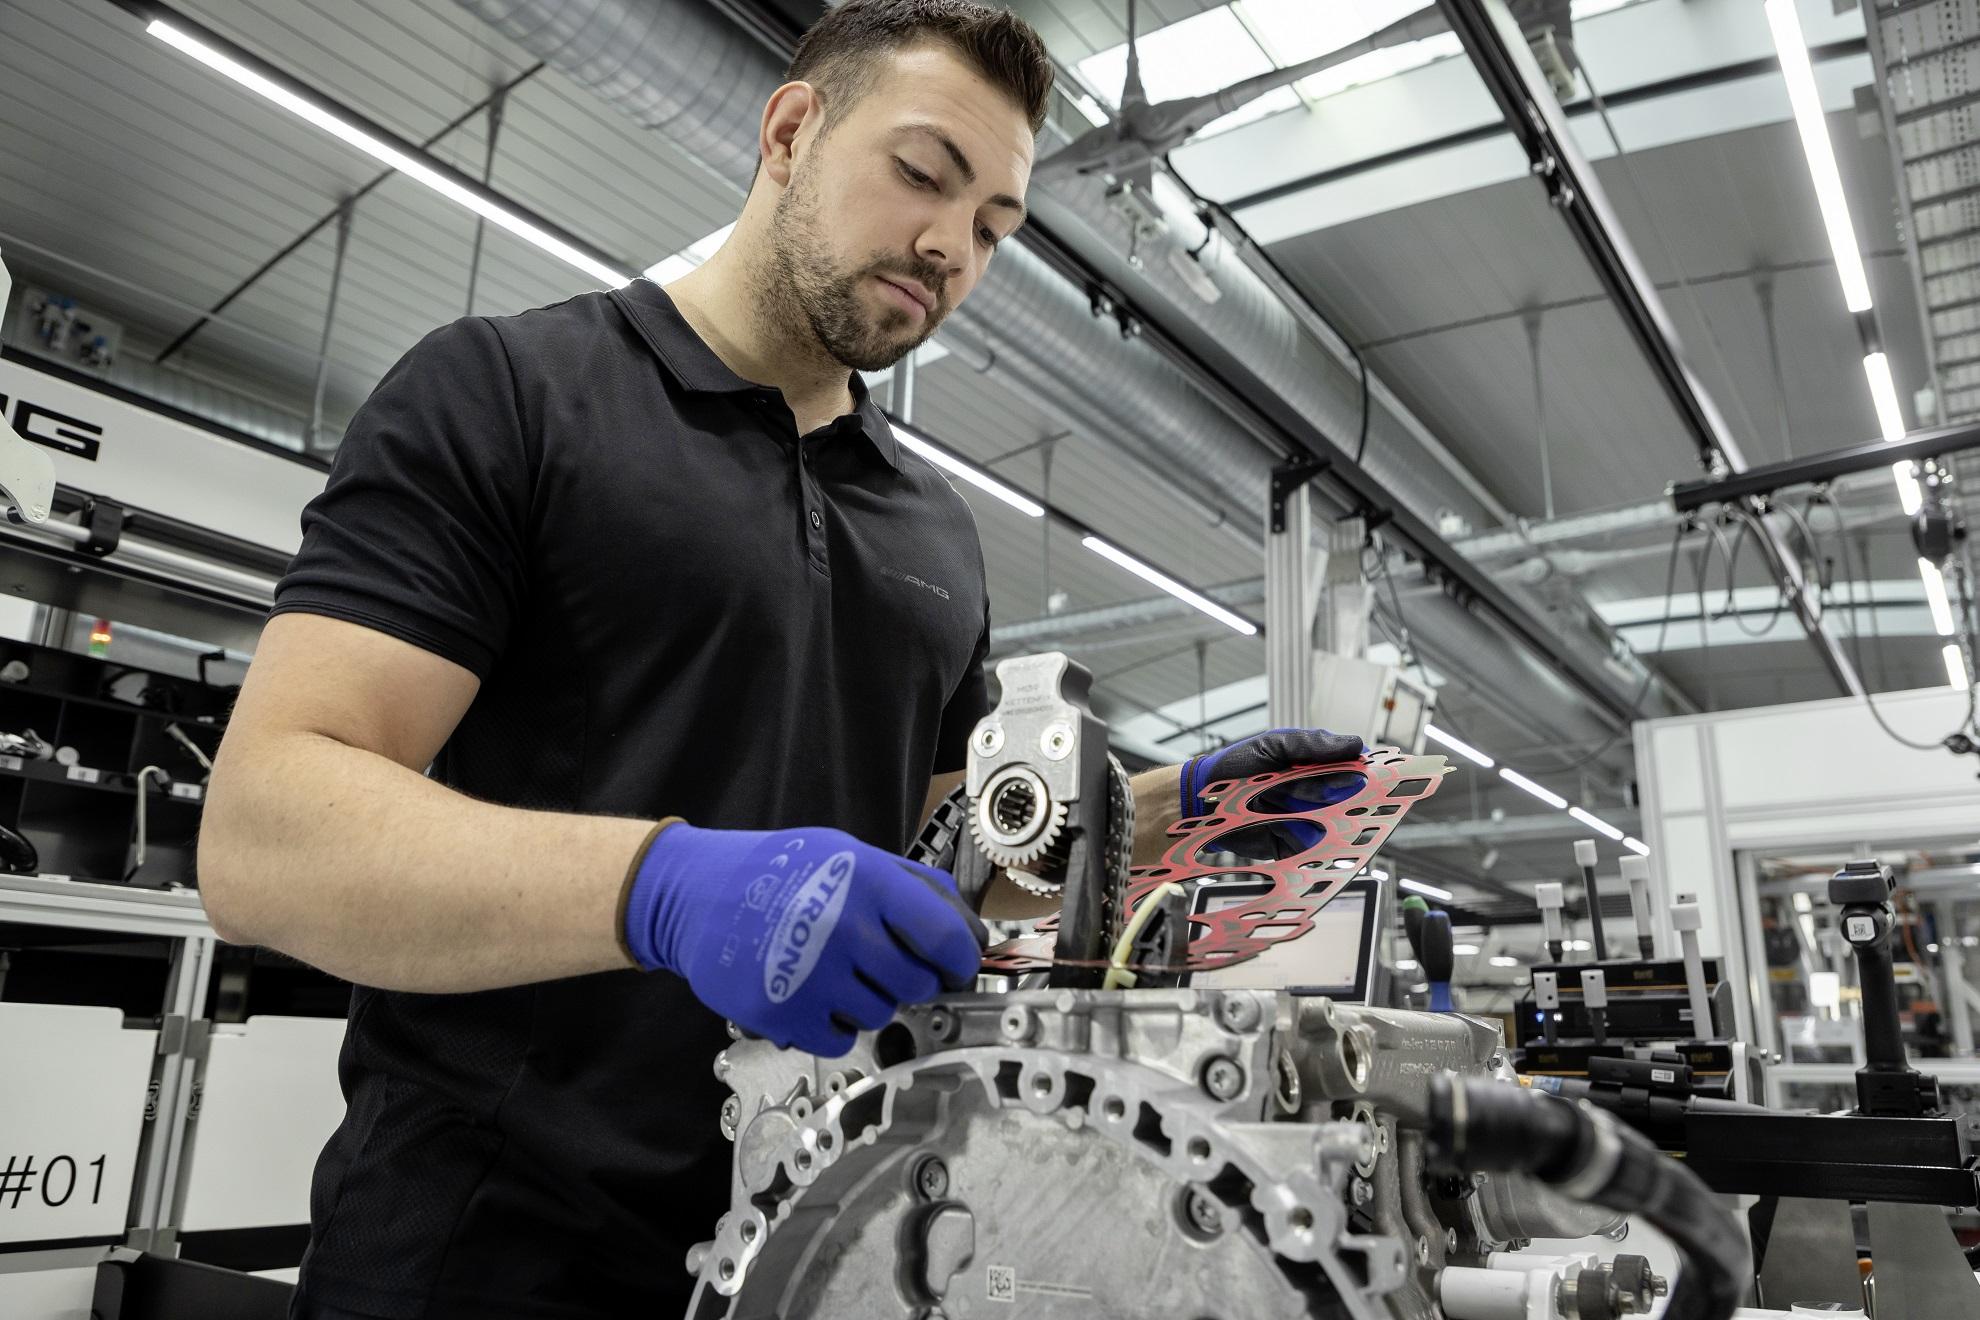 Mercedes-AMG Produktion M139 2019 Mercedes-AMG Production M139 2019